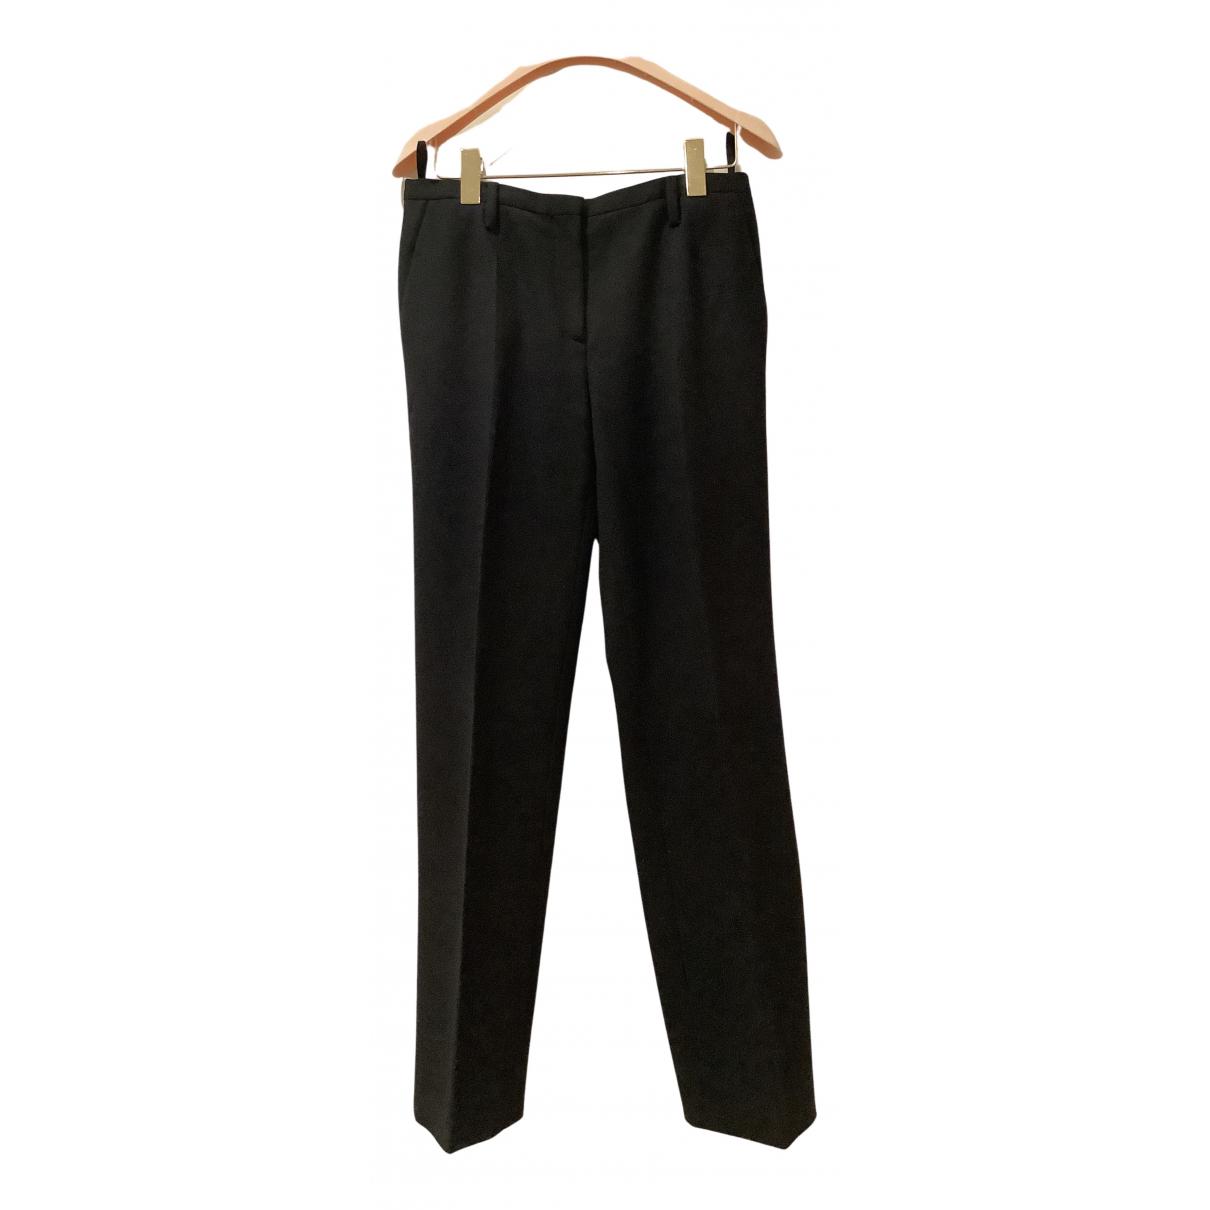 Prada N Black Wool Trousers for Women 40 IT